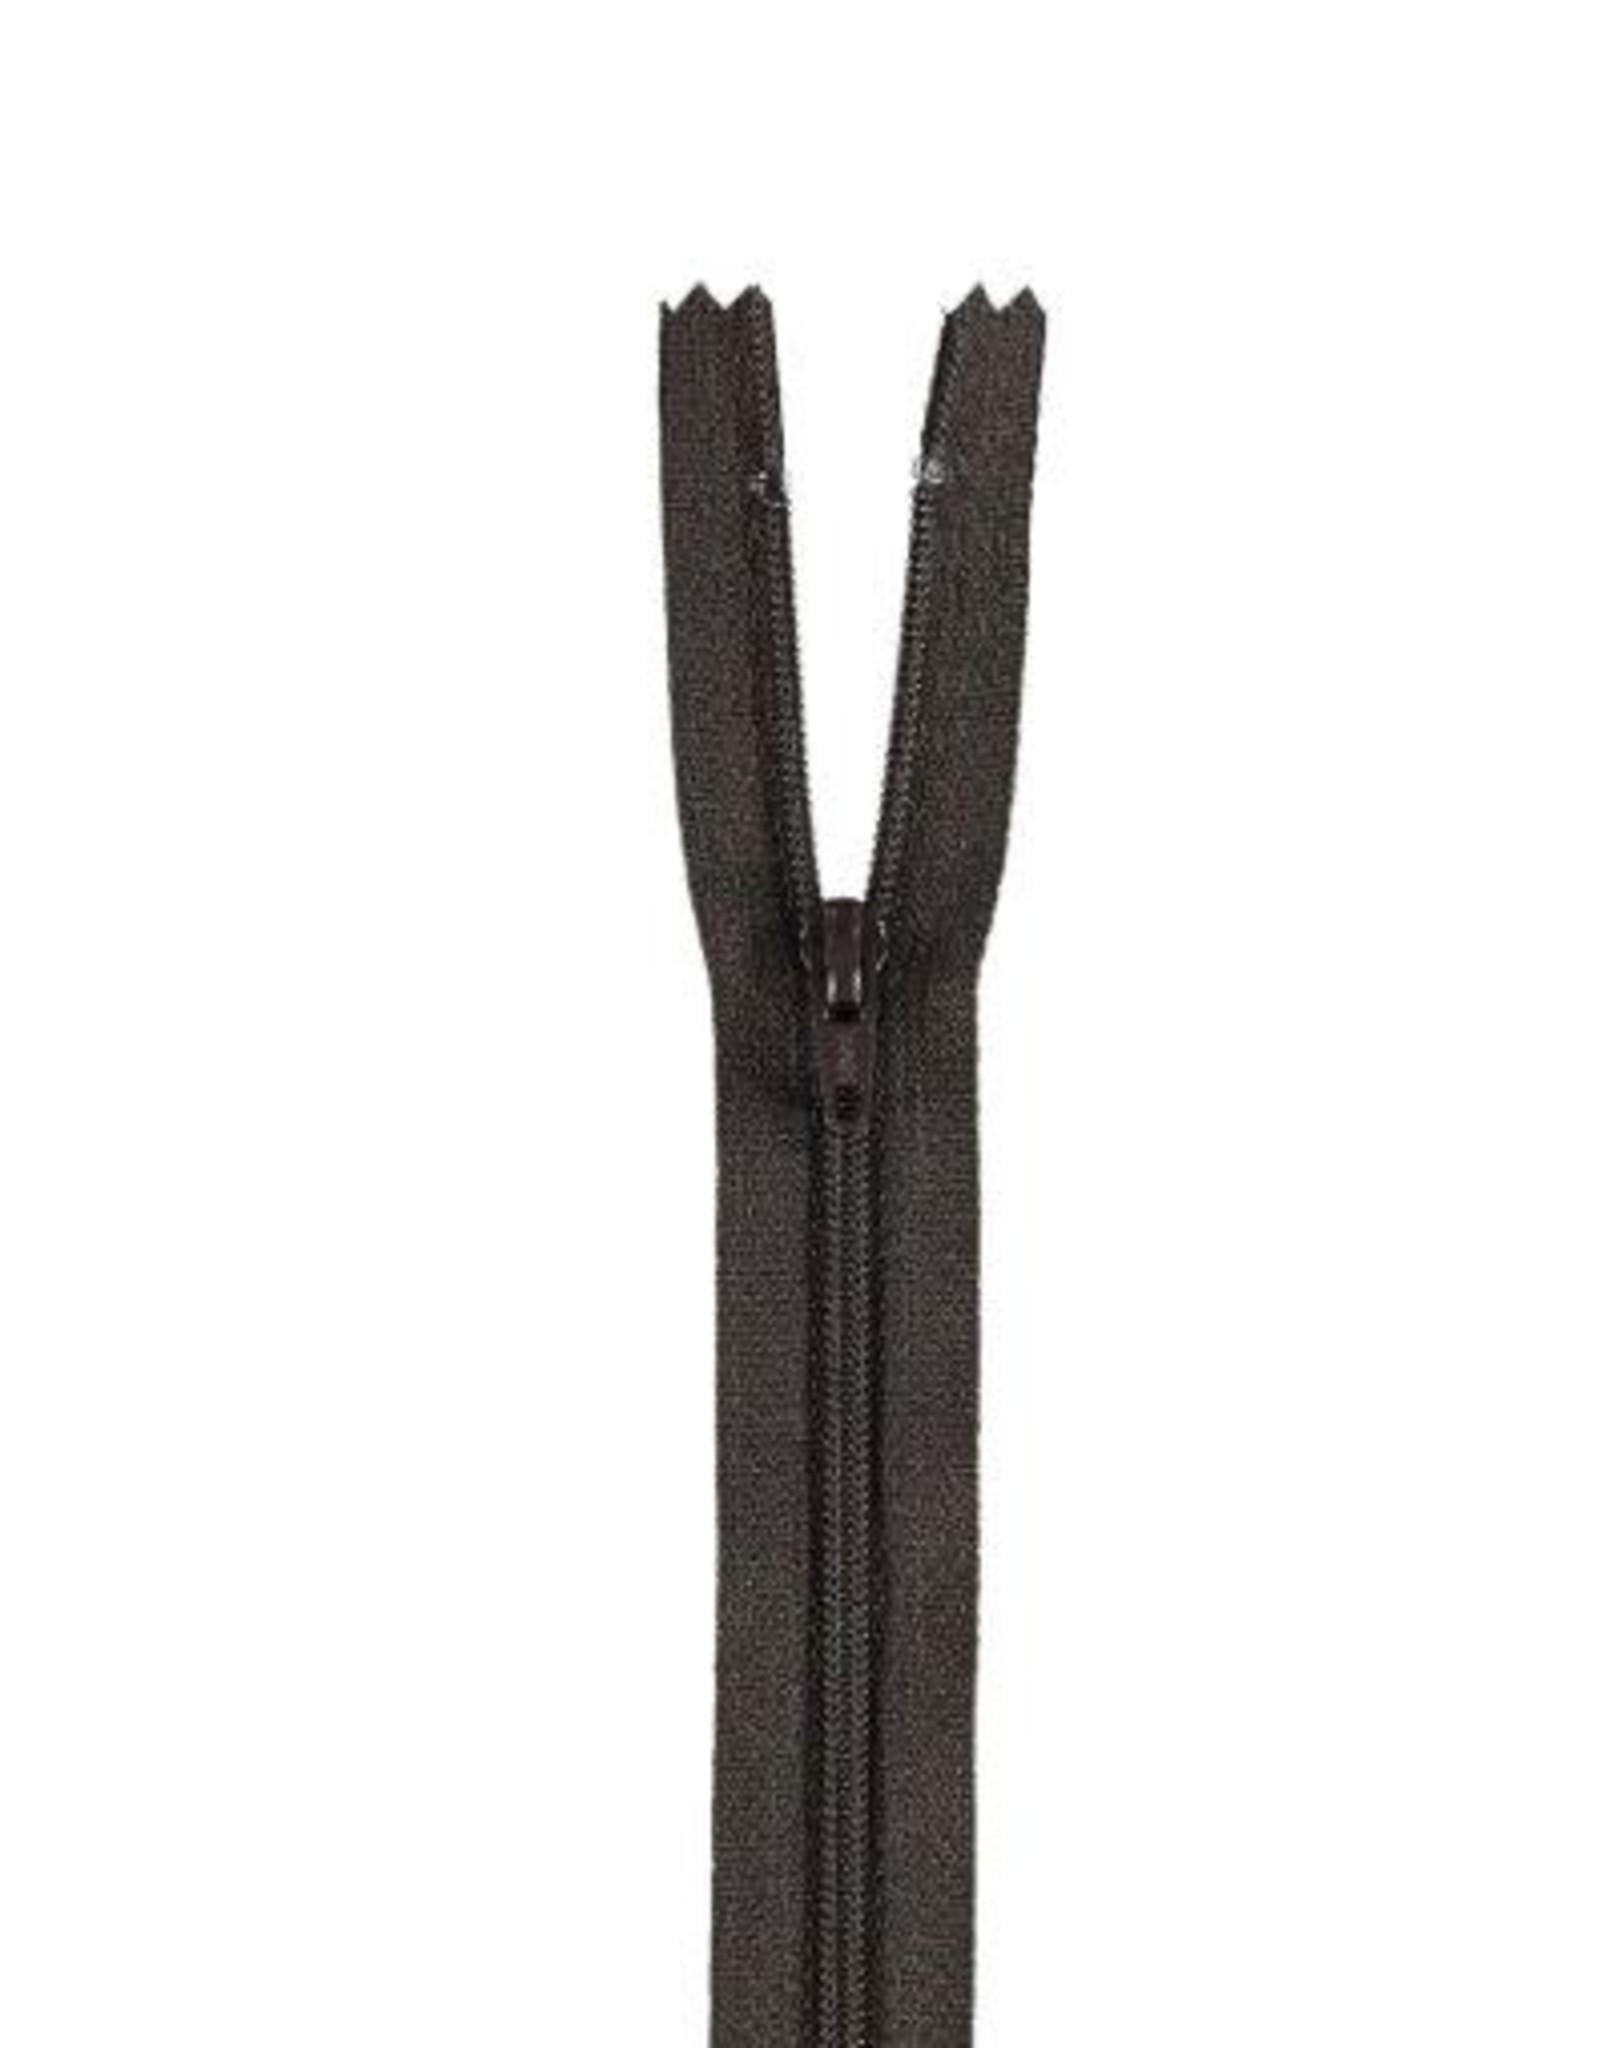 YKK Spiraalrits niet-DB 3mm zwart bruin 916-45cm